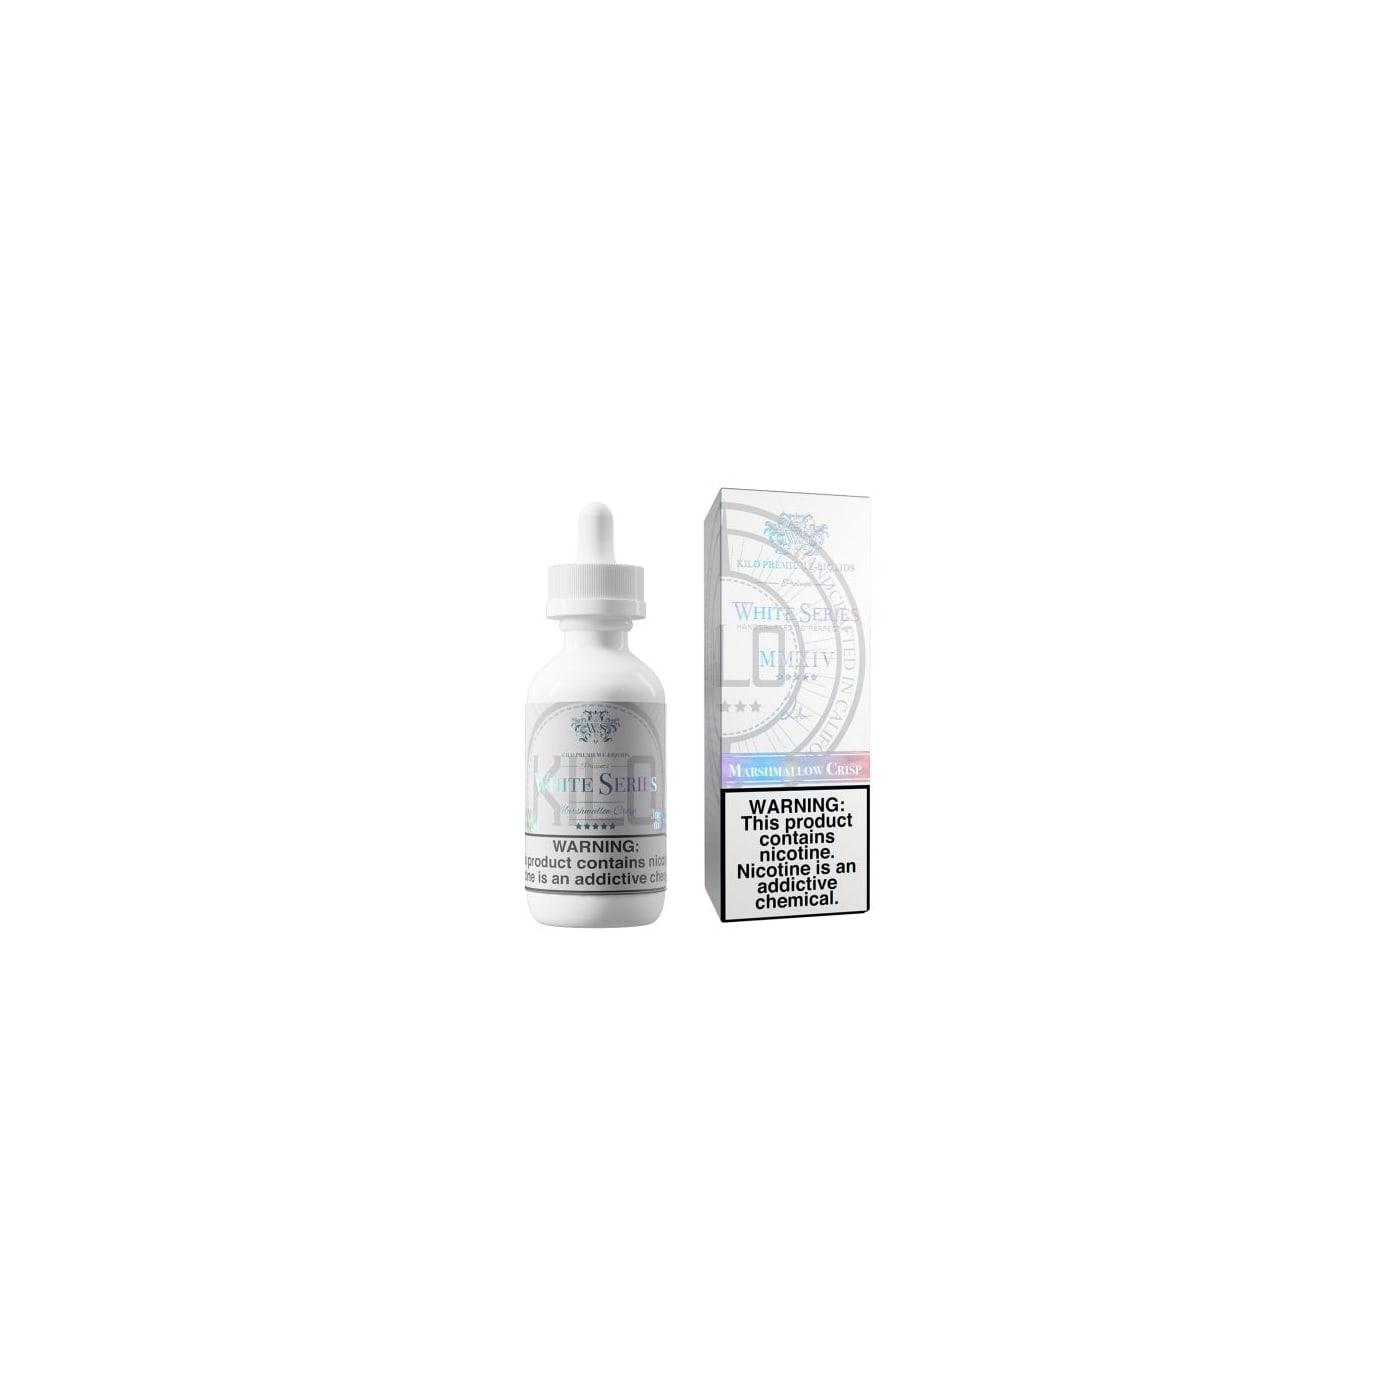 Marshmallow Crisp 60ml E-Juice - Kilo White Series E-liquid